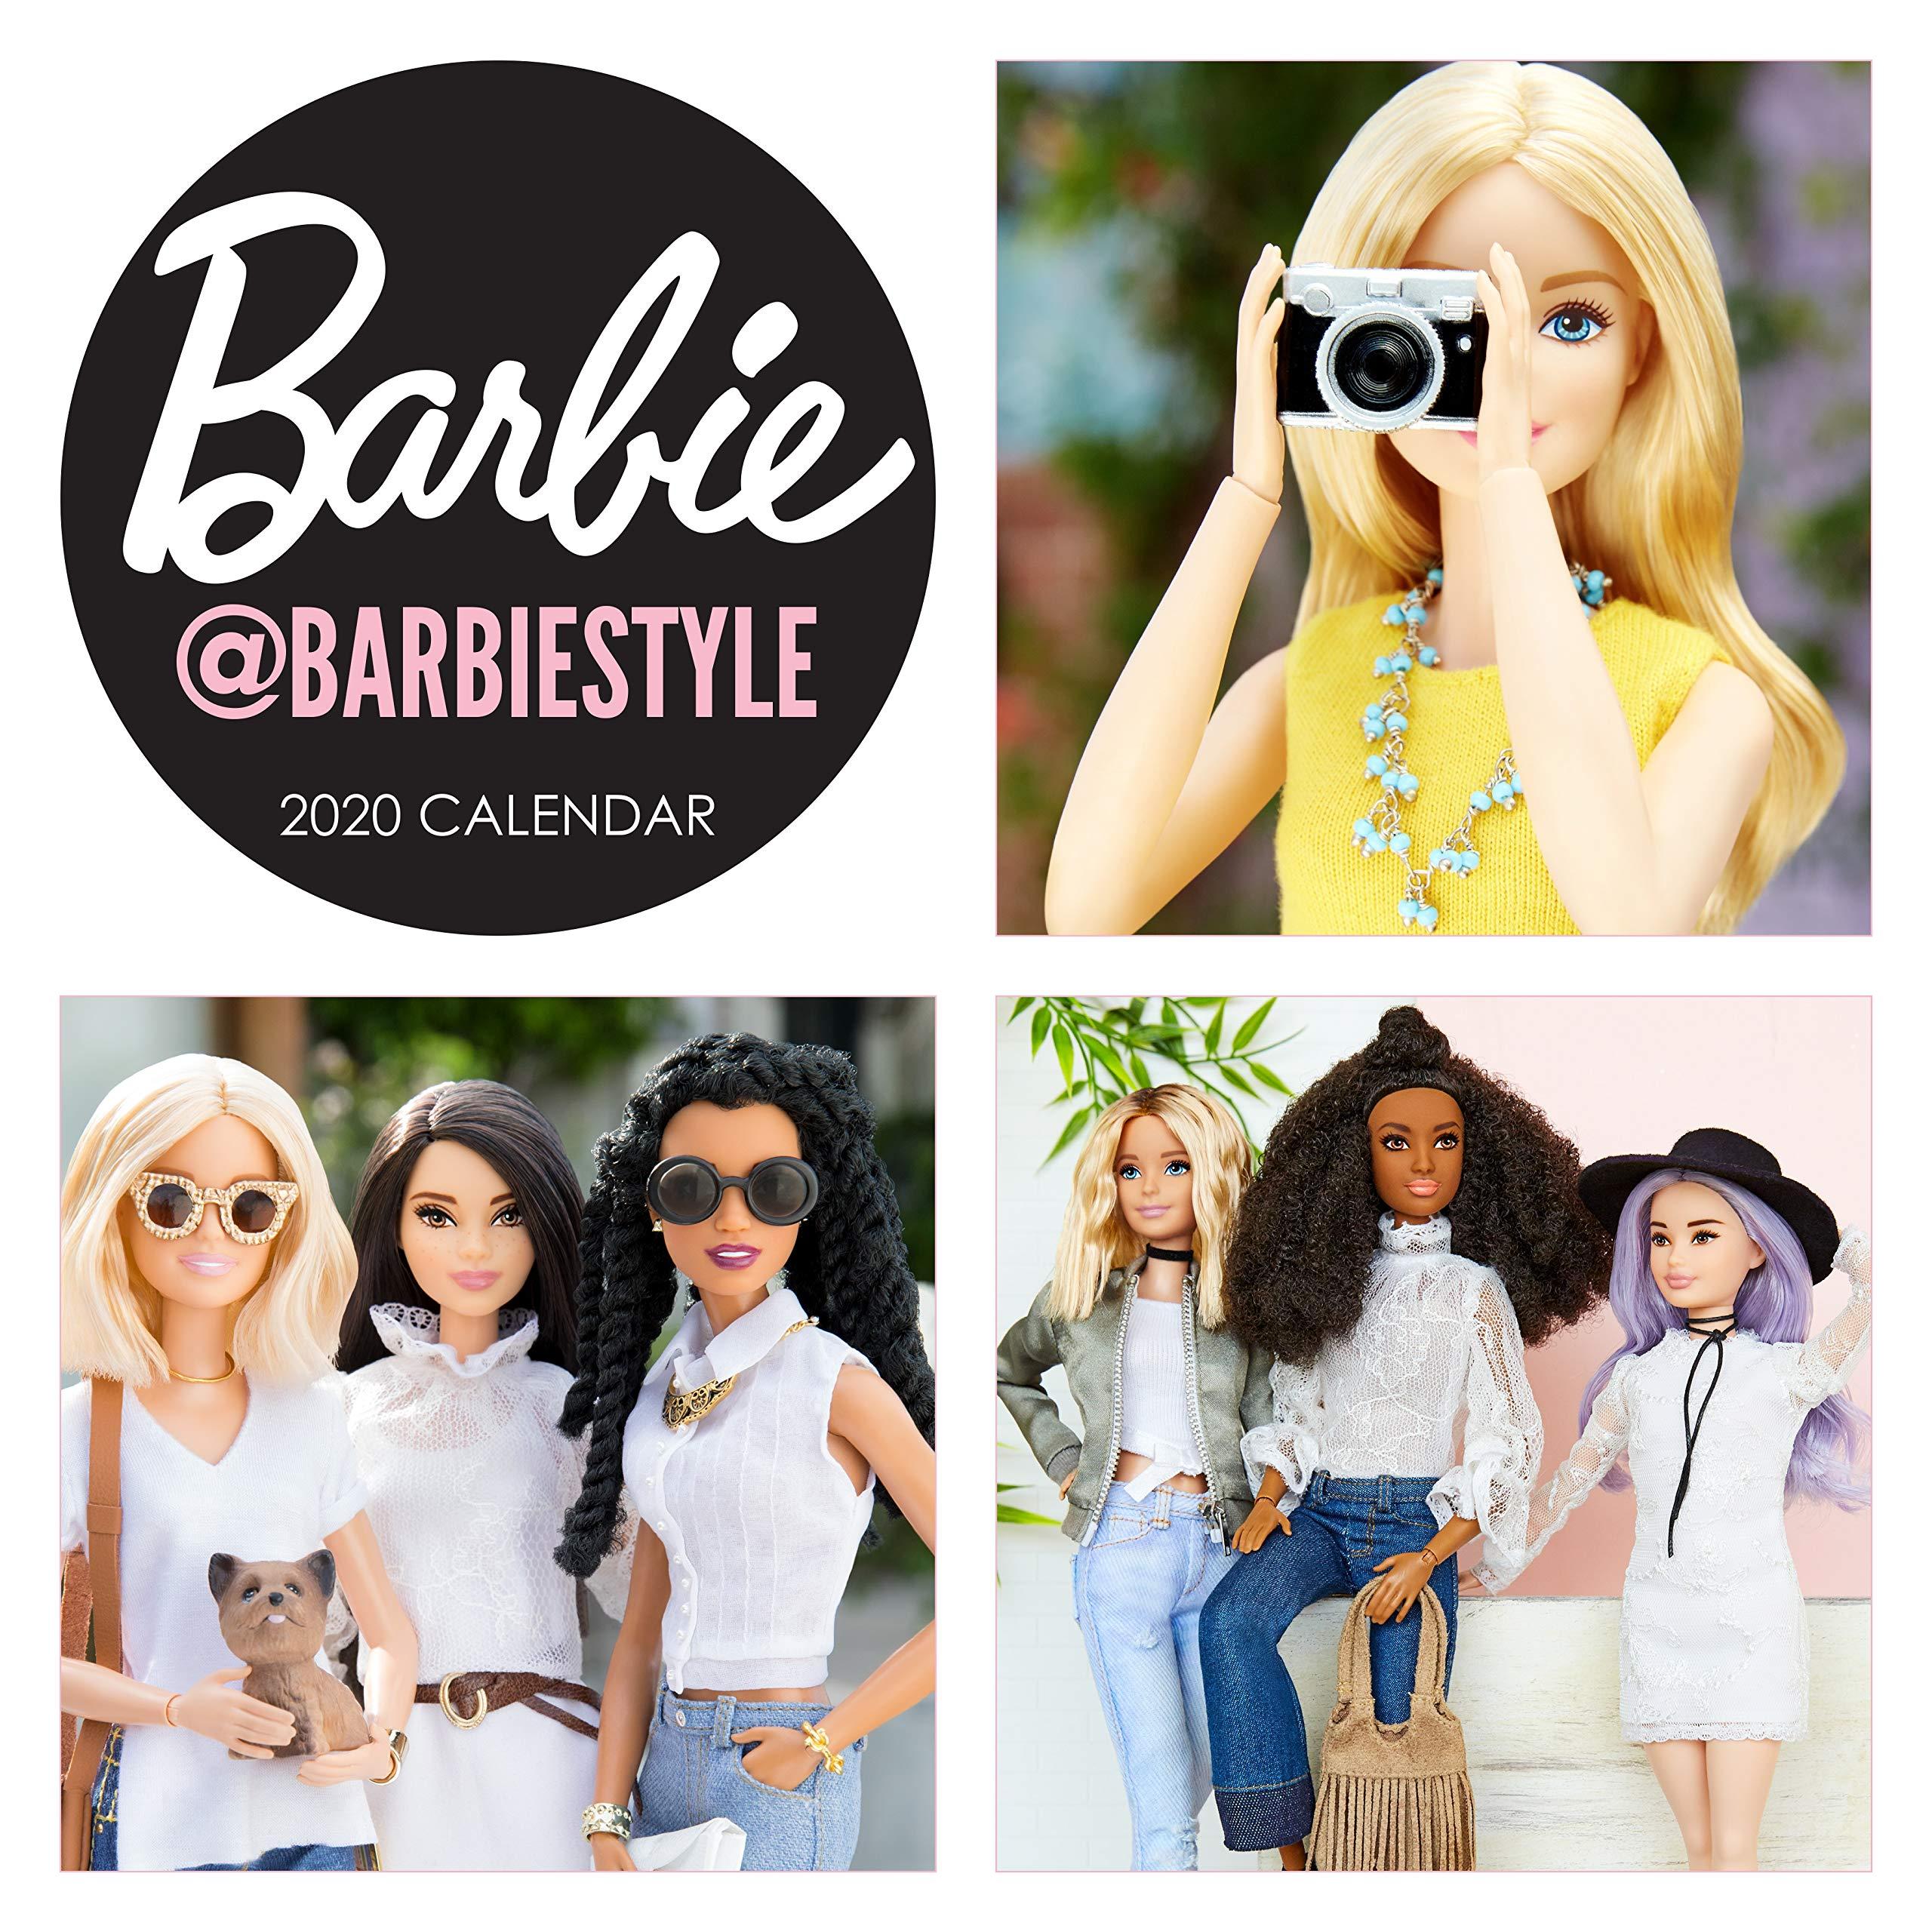 Barbie @barbiestyle 2020 Wall Calendar: Amazon.co.uk: Mattel